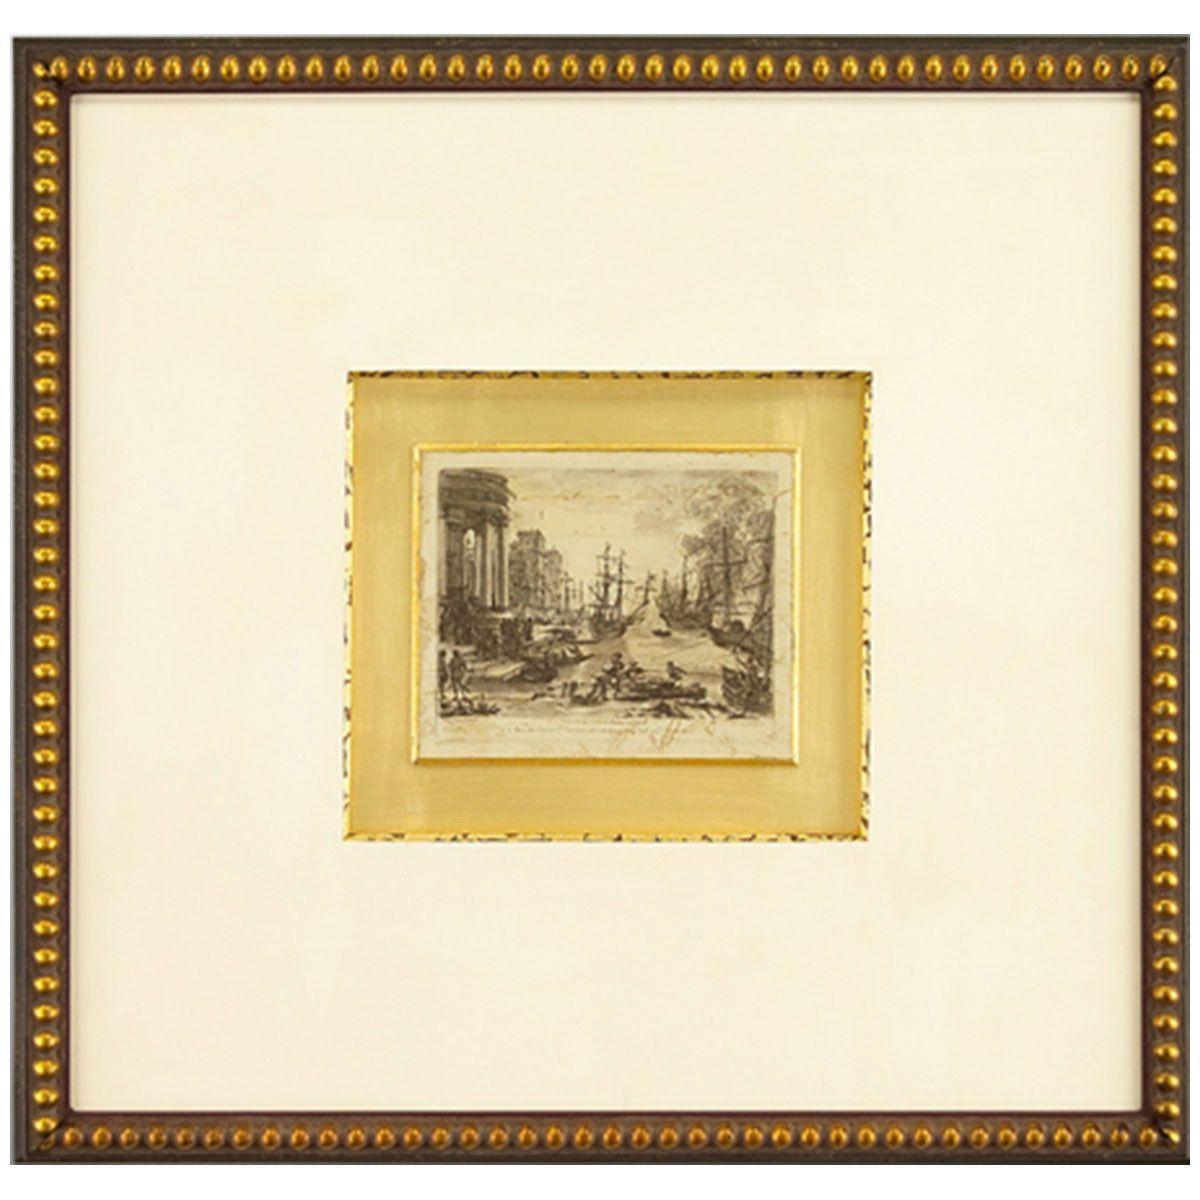 Dorable John Richard Wall Decor Composition - Art & Wall Decor ...